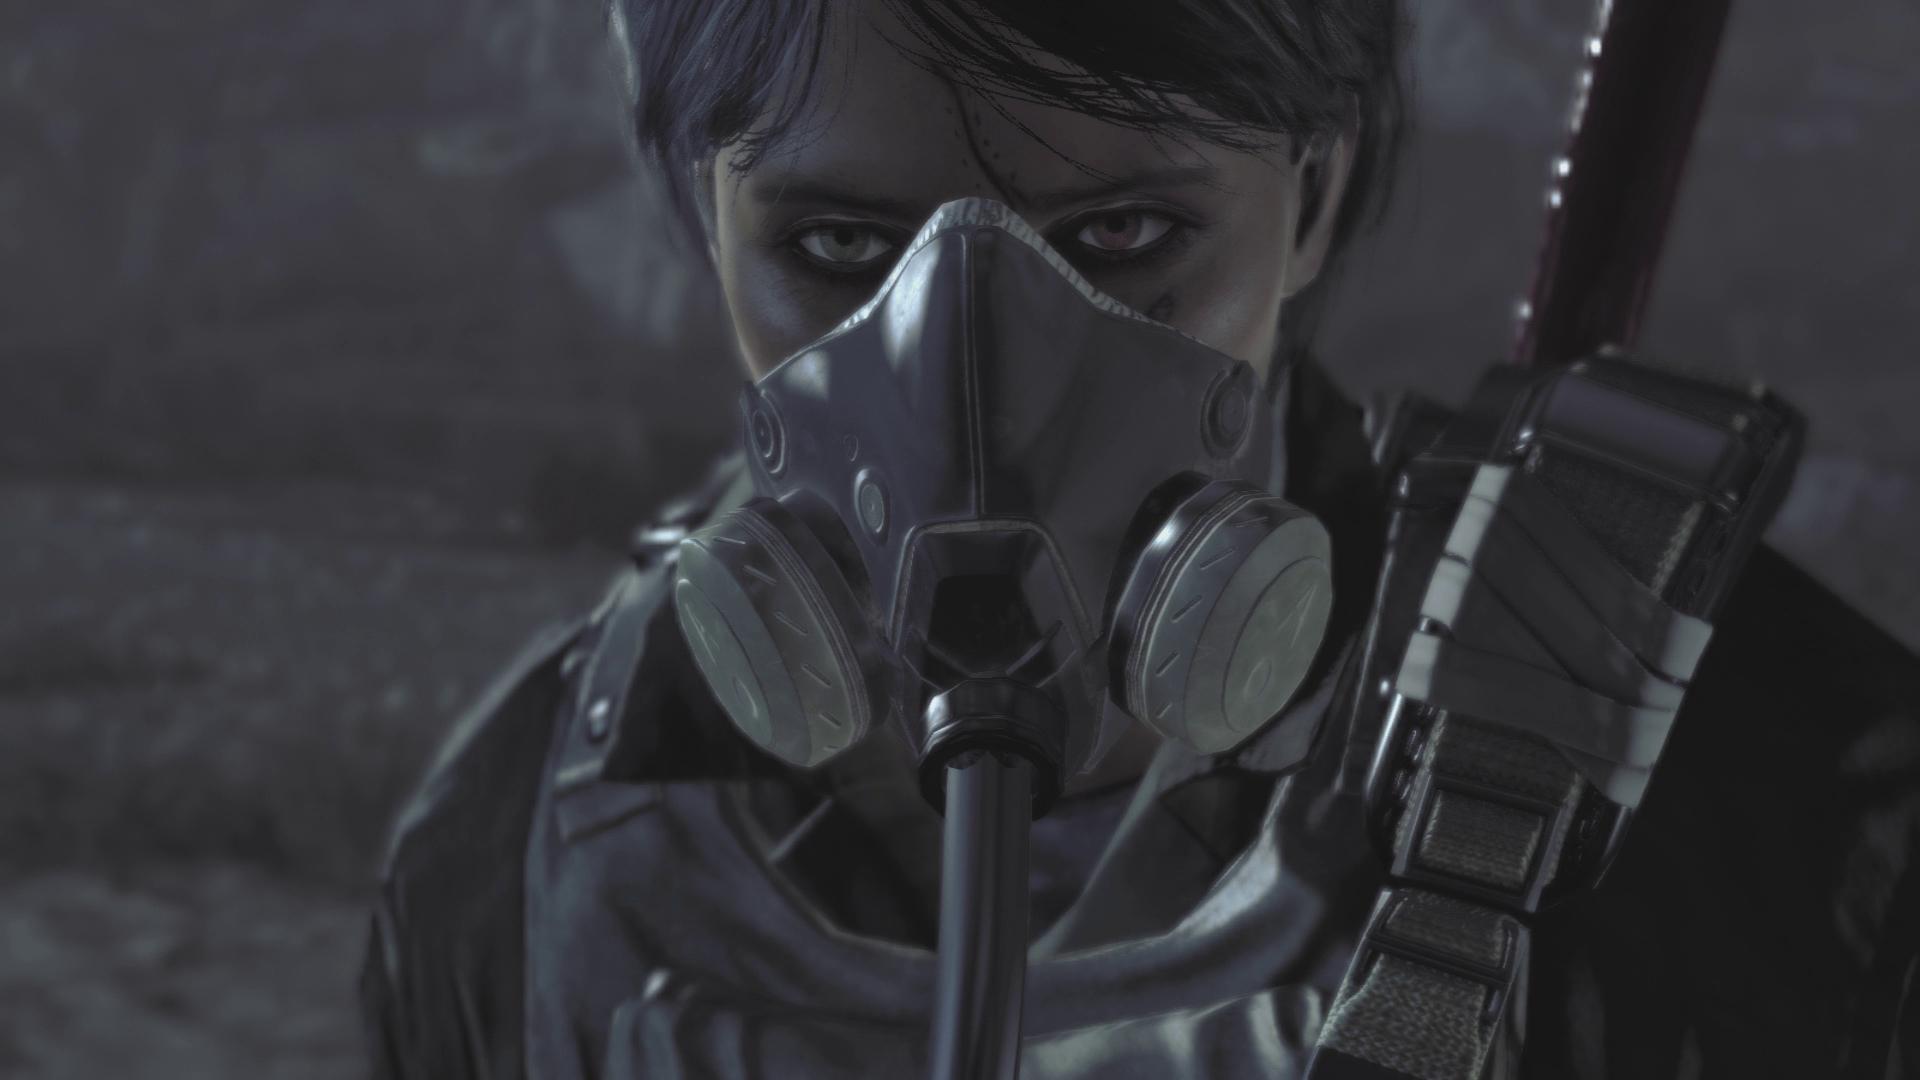 Konami: Metal gear veteran working on secret game